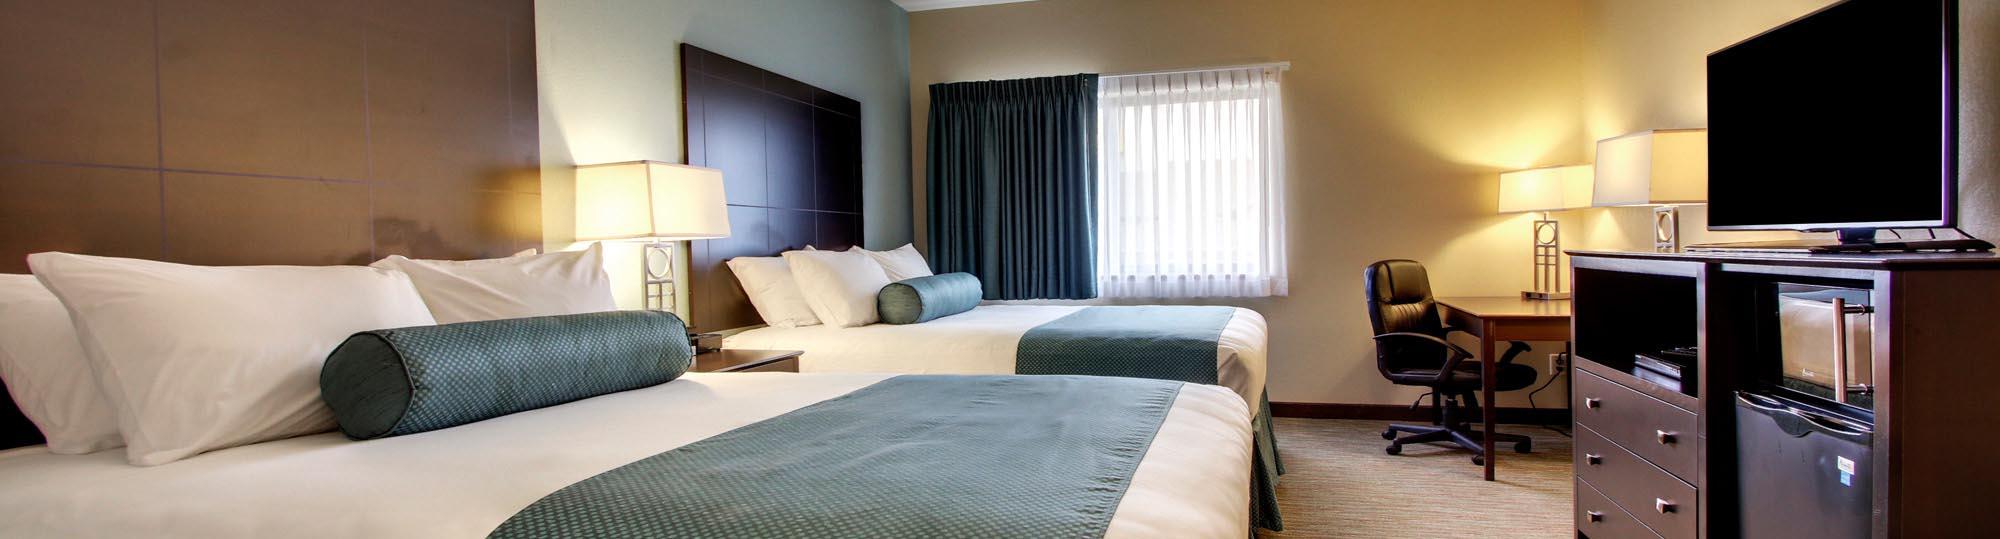 Cobblestone Inn and Suites Fort Dodge